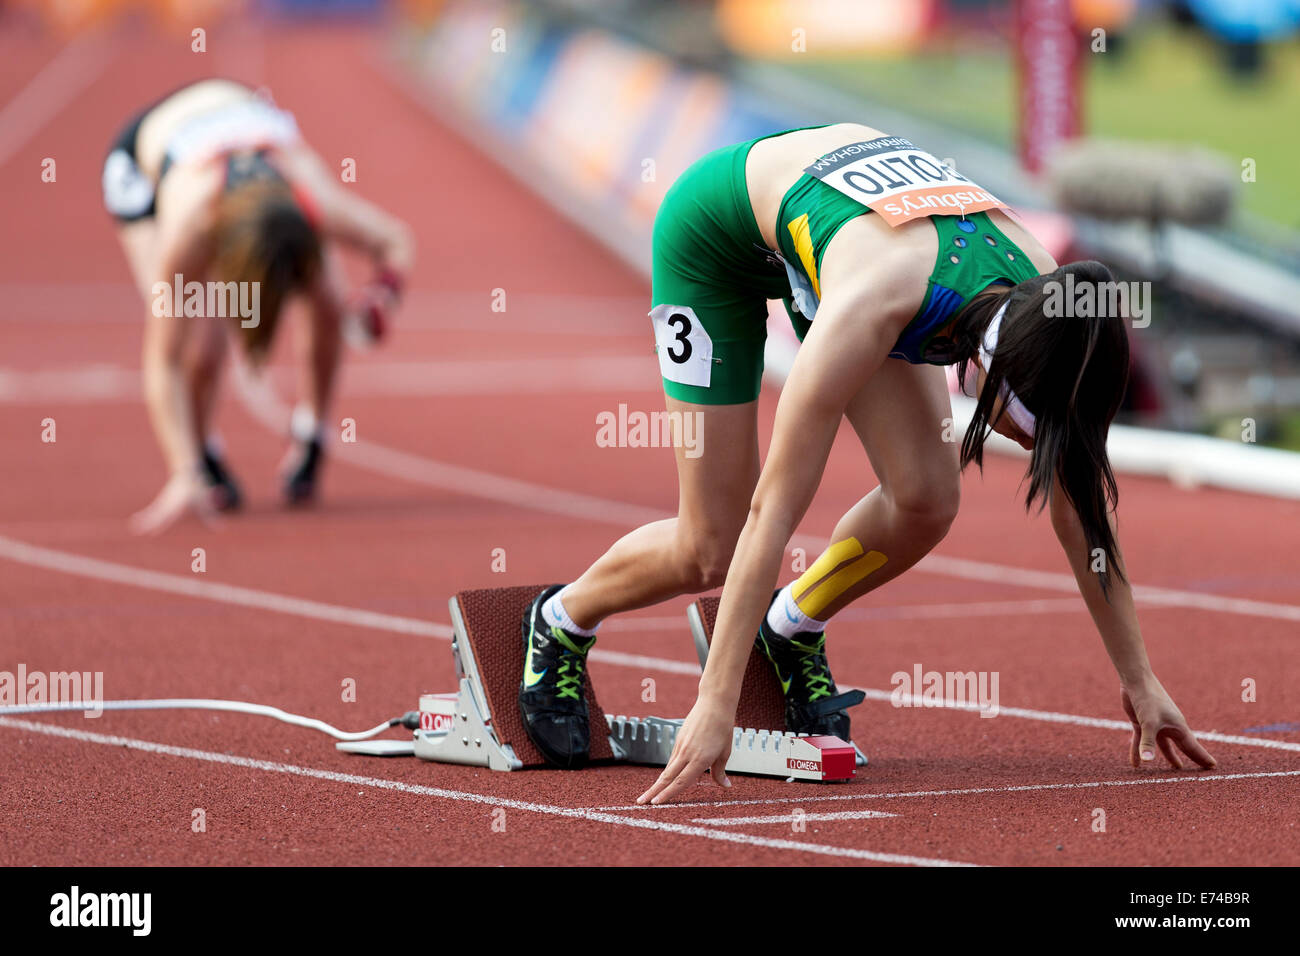 Veronica HIPOLITO, Women's 400m T37-38, 2014 IPC Sainsbury's Birmingham Grand Prix, Alexander Stadium, UK - Stock Image